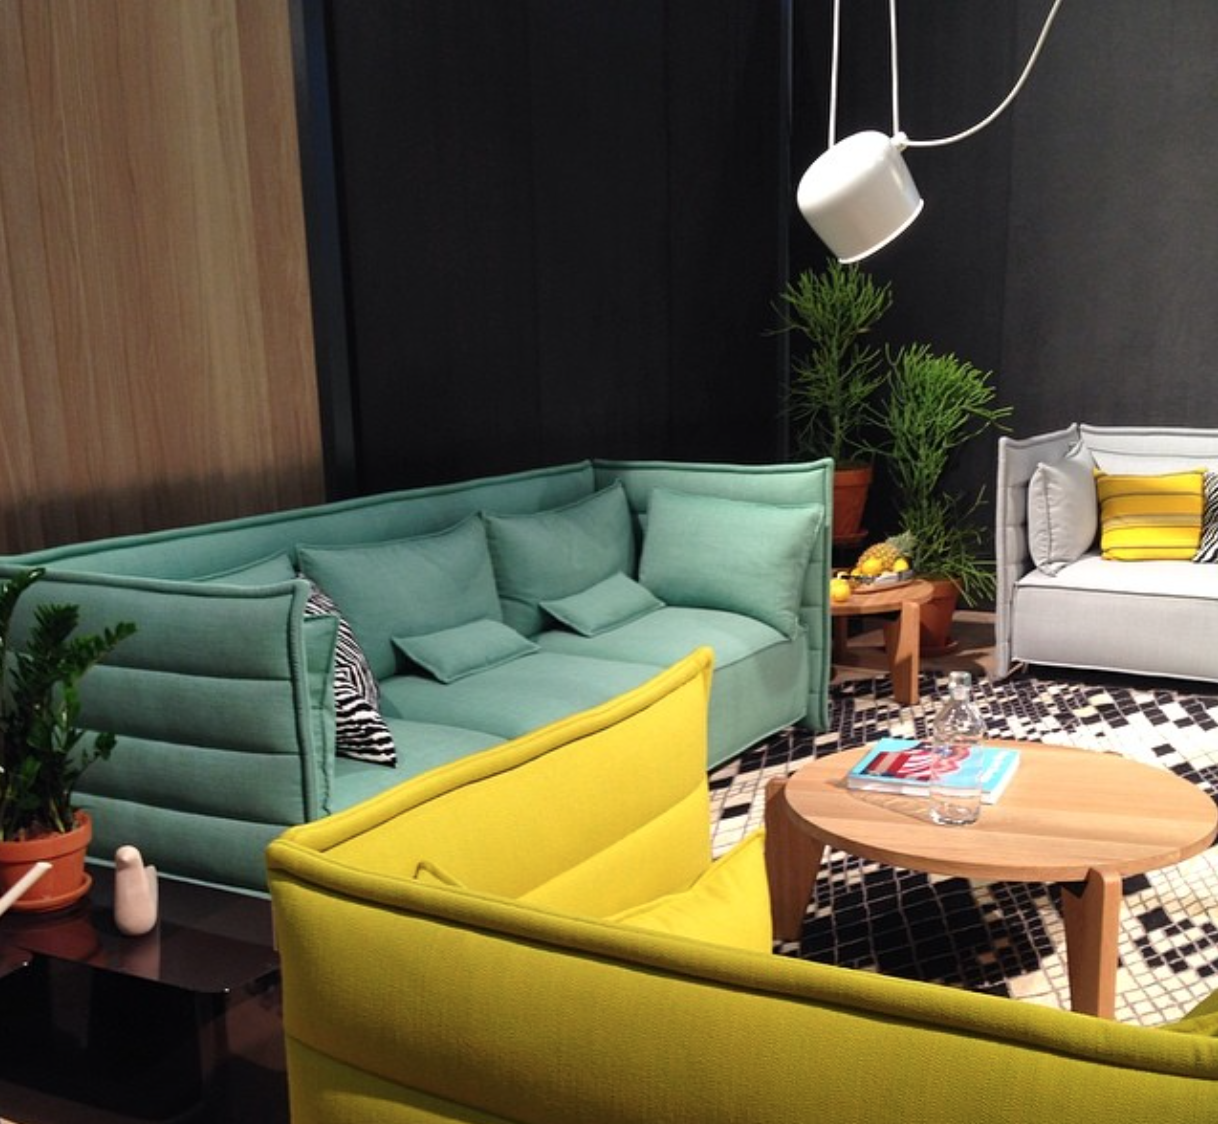 dwell instagram vitra green sofas icff 2014